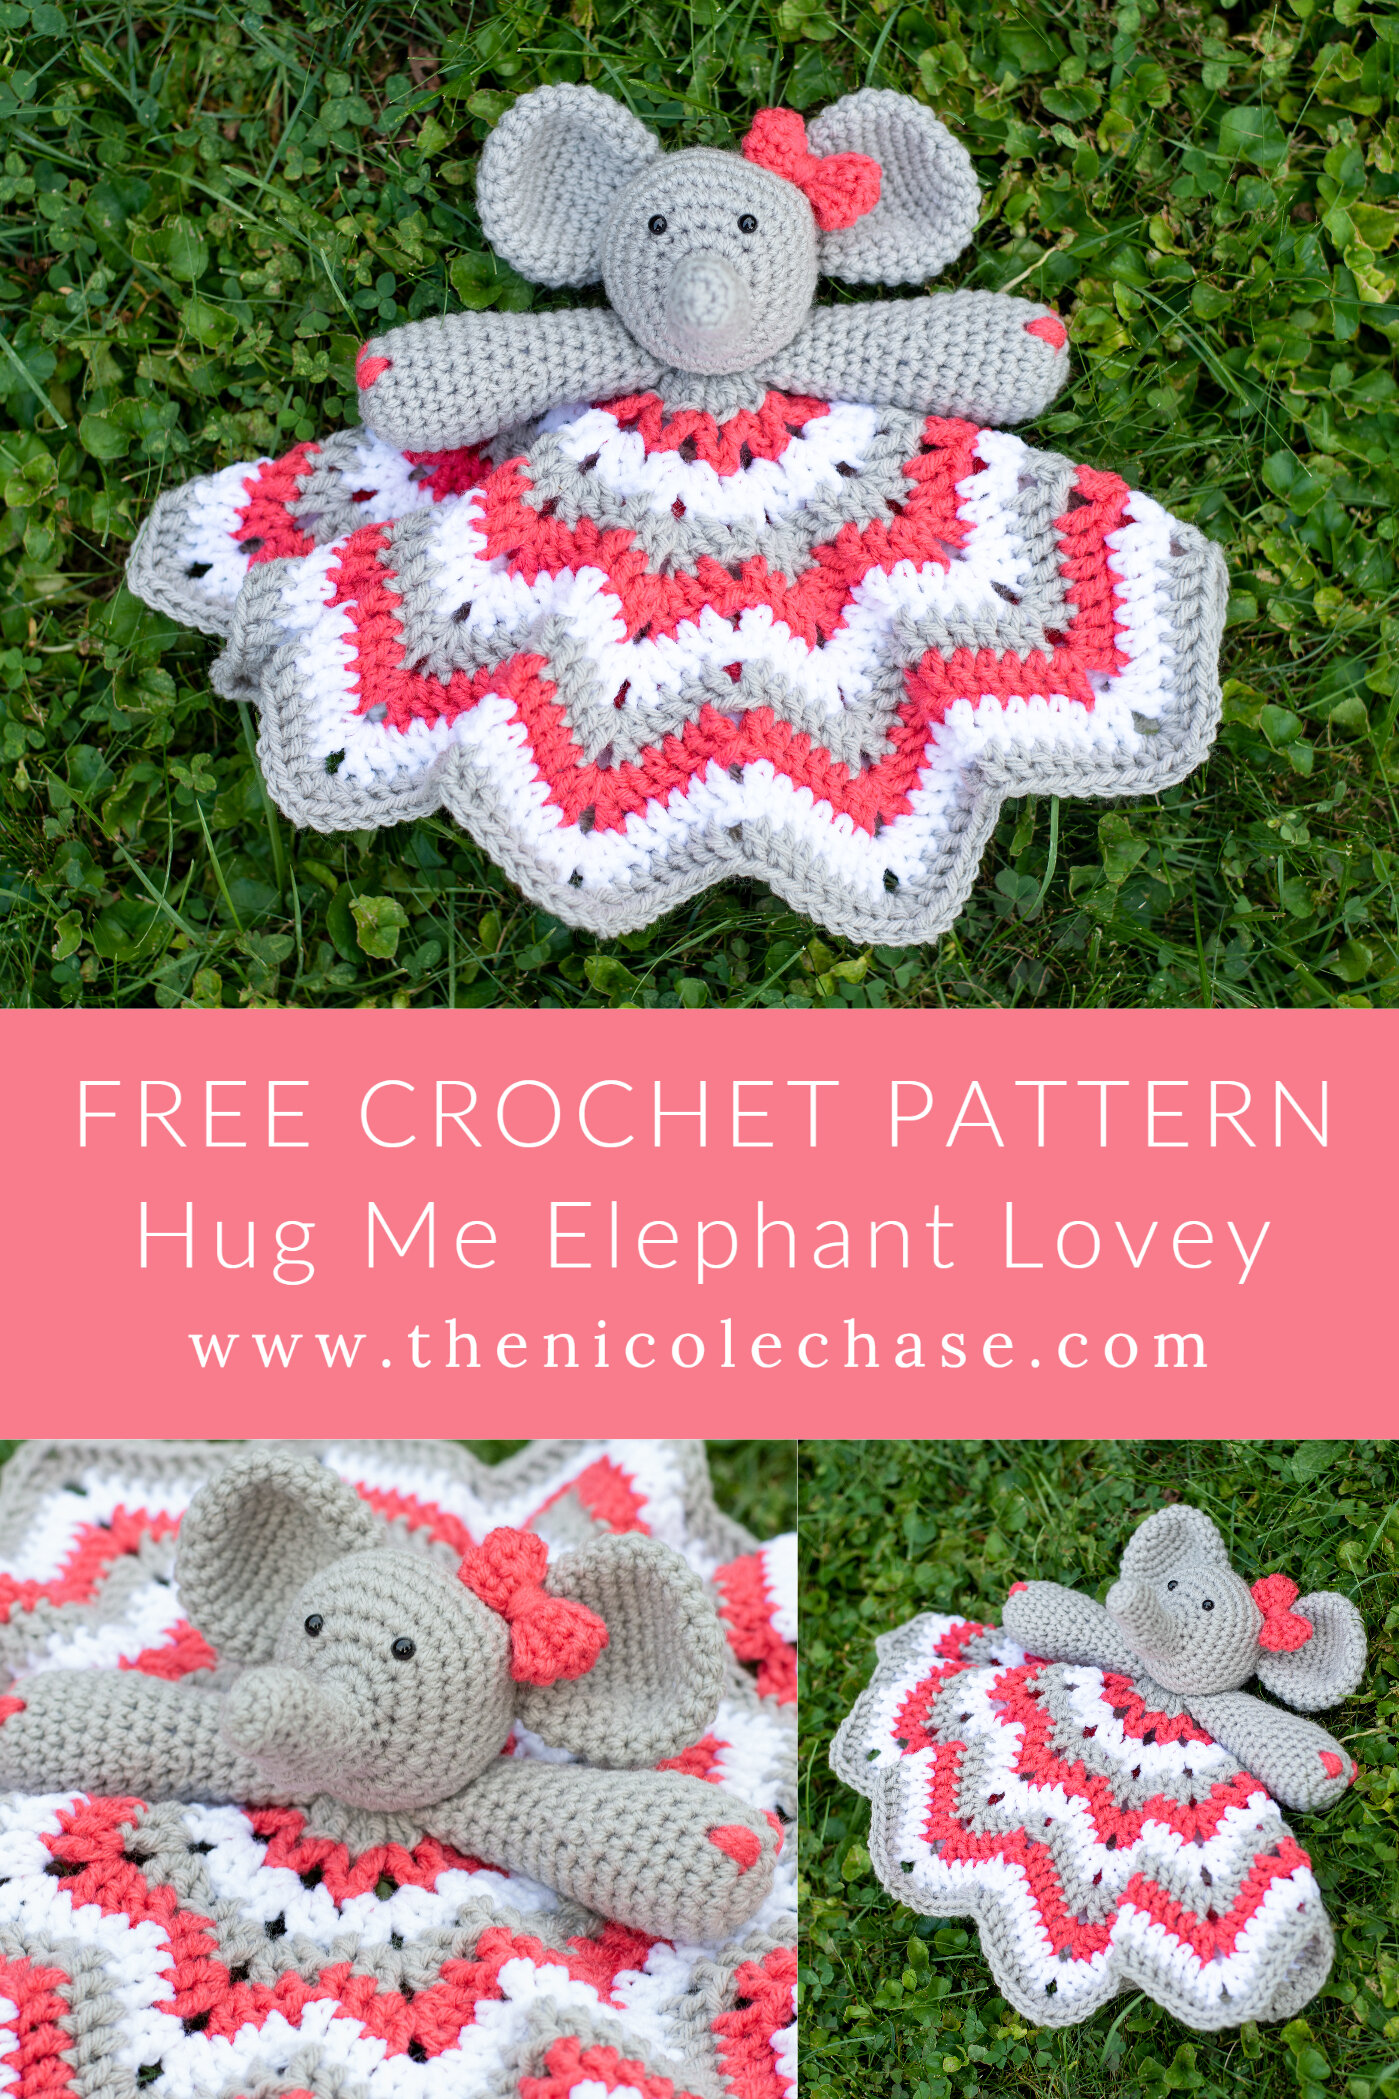 Hug Me Elephant Lovey Free Crochet Pattern Nicole Chase